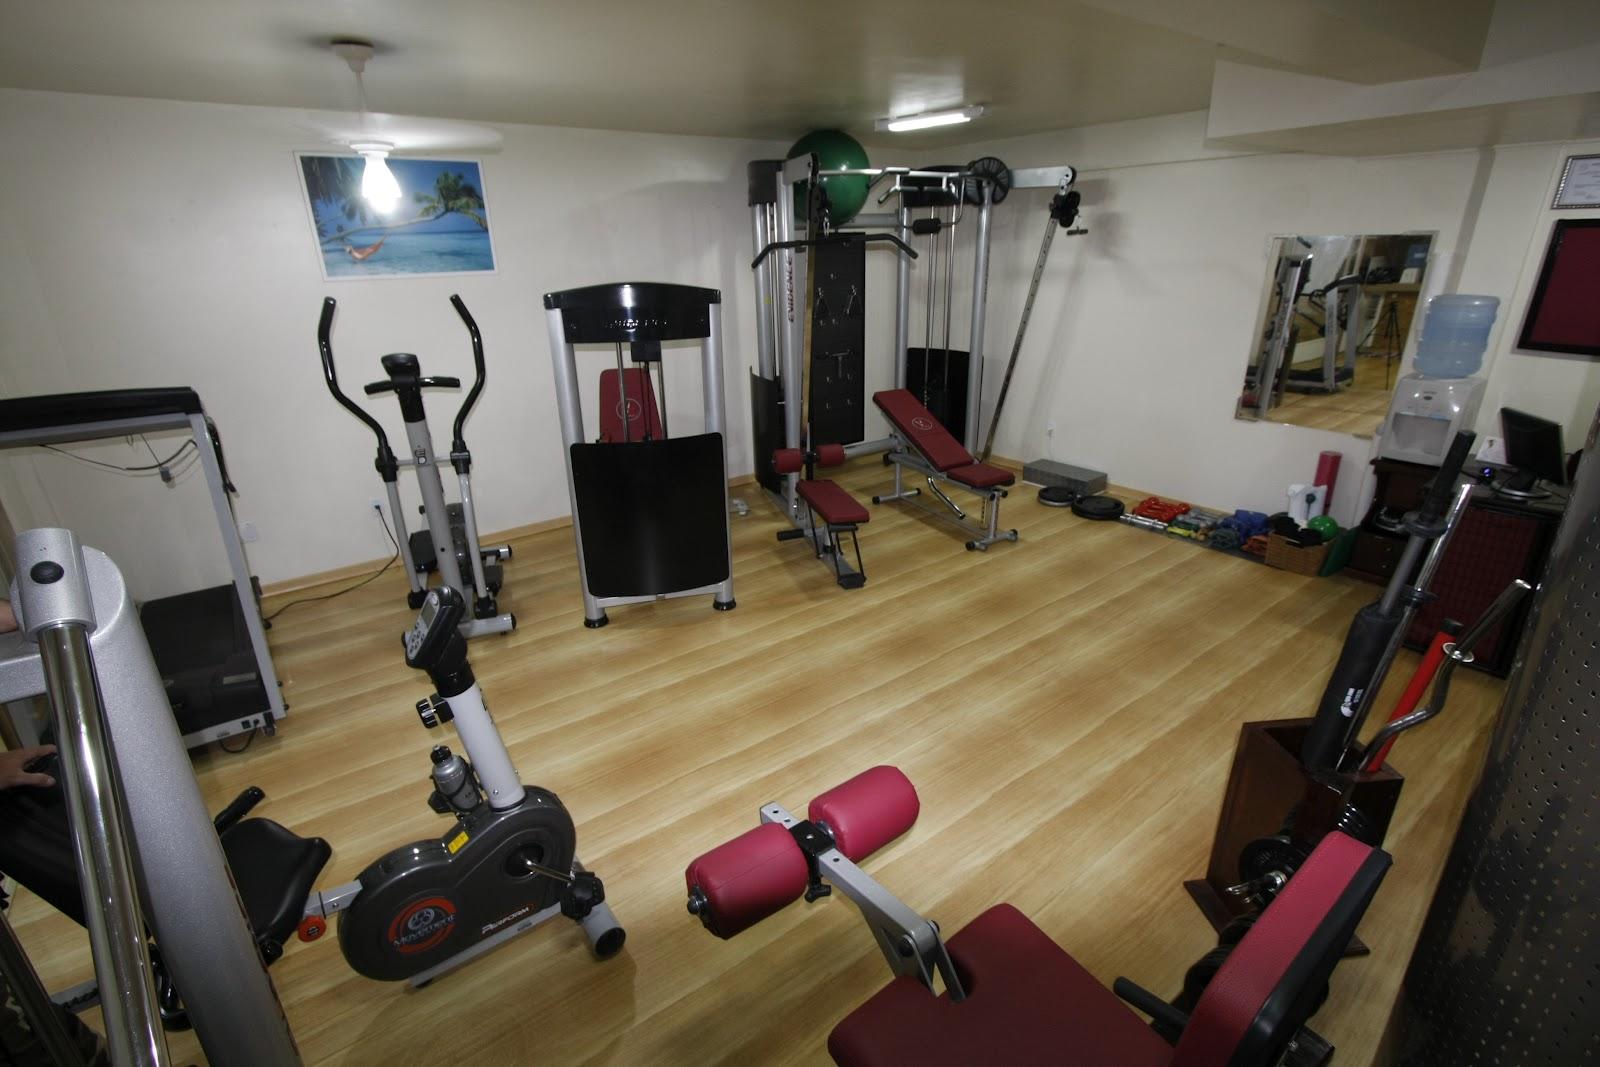 #644430 Personal Trainer Porto Alegre 3239 7994: Galeria de fotos 482 Janelas Duplas Porto